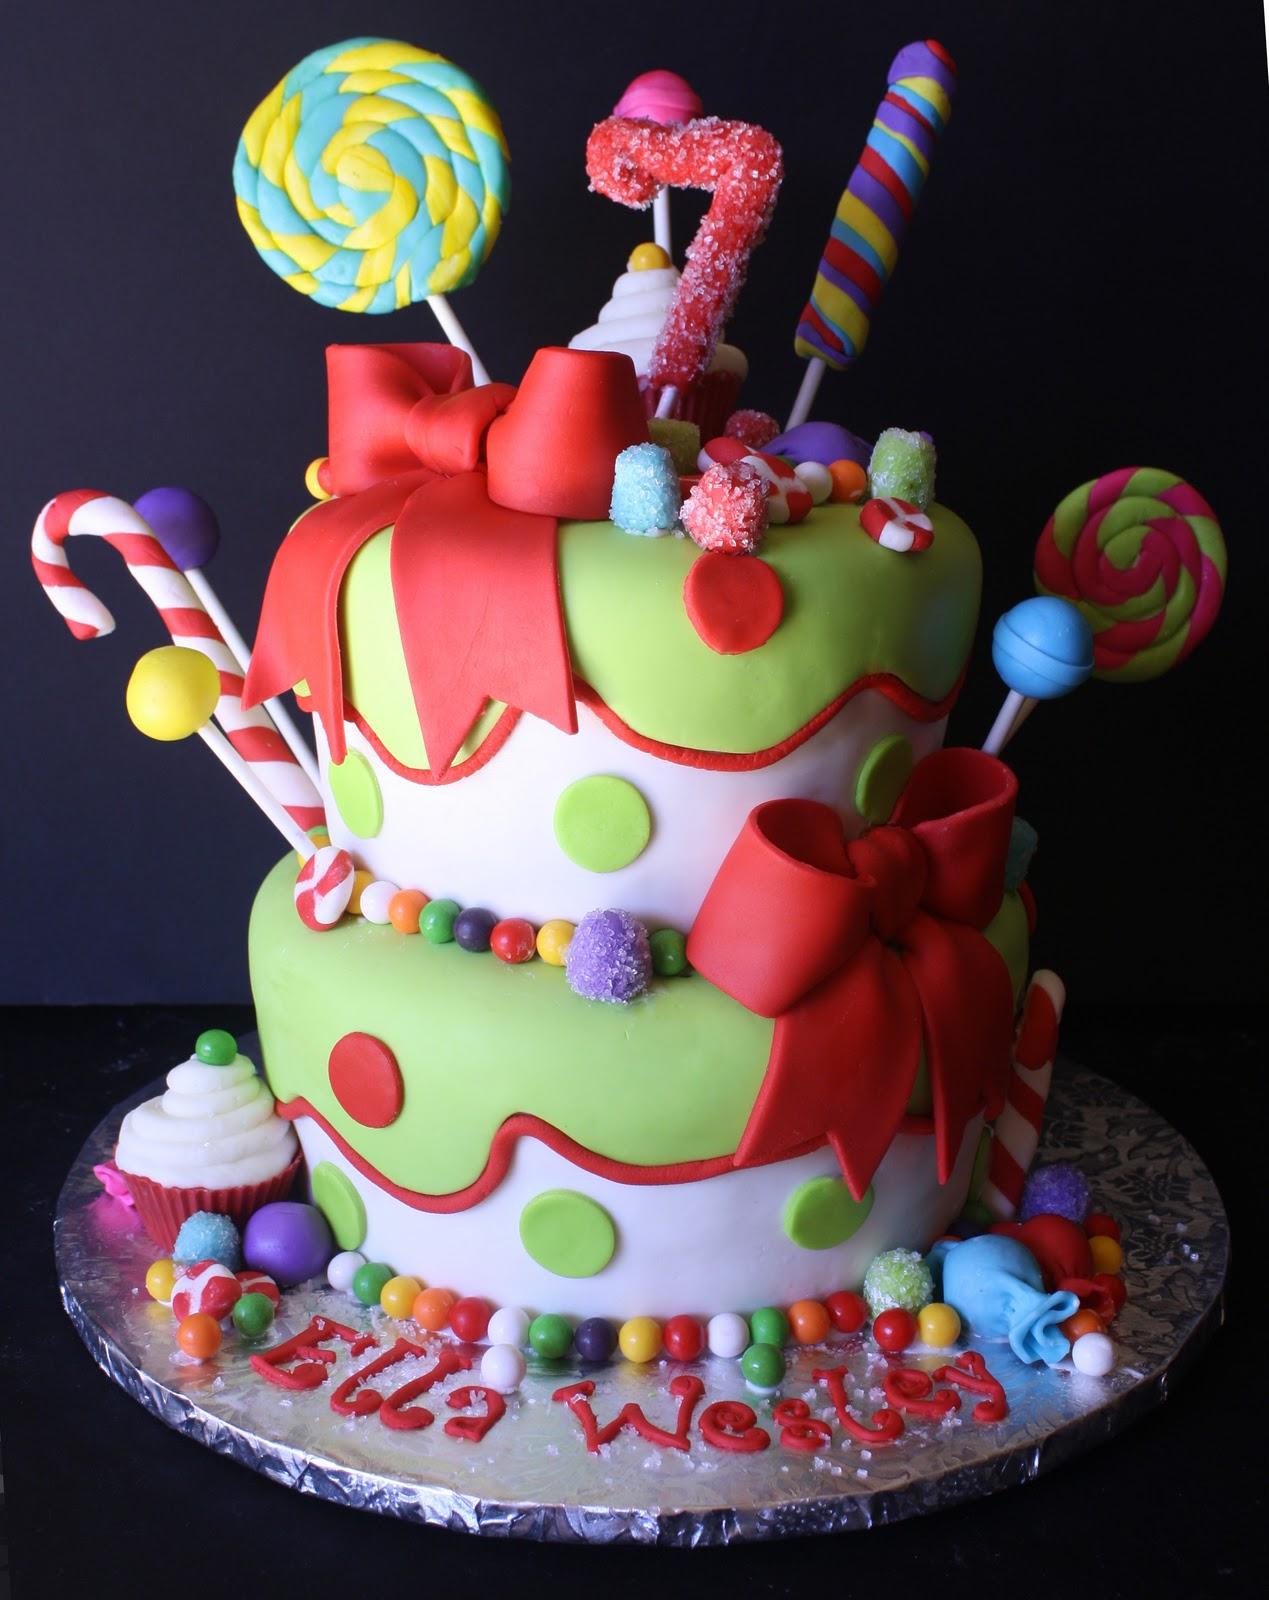 2 Yr Old Boy Birthday Cakes